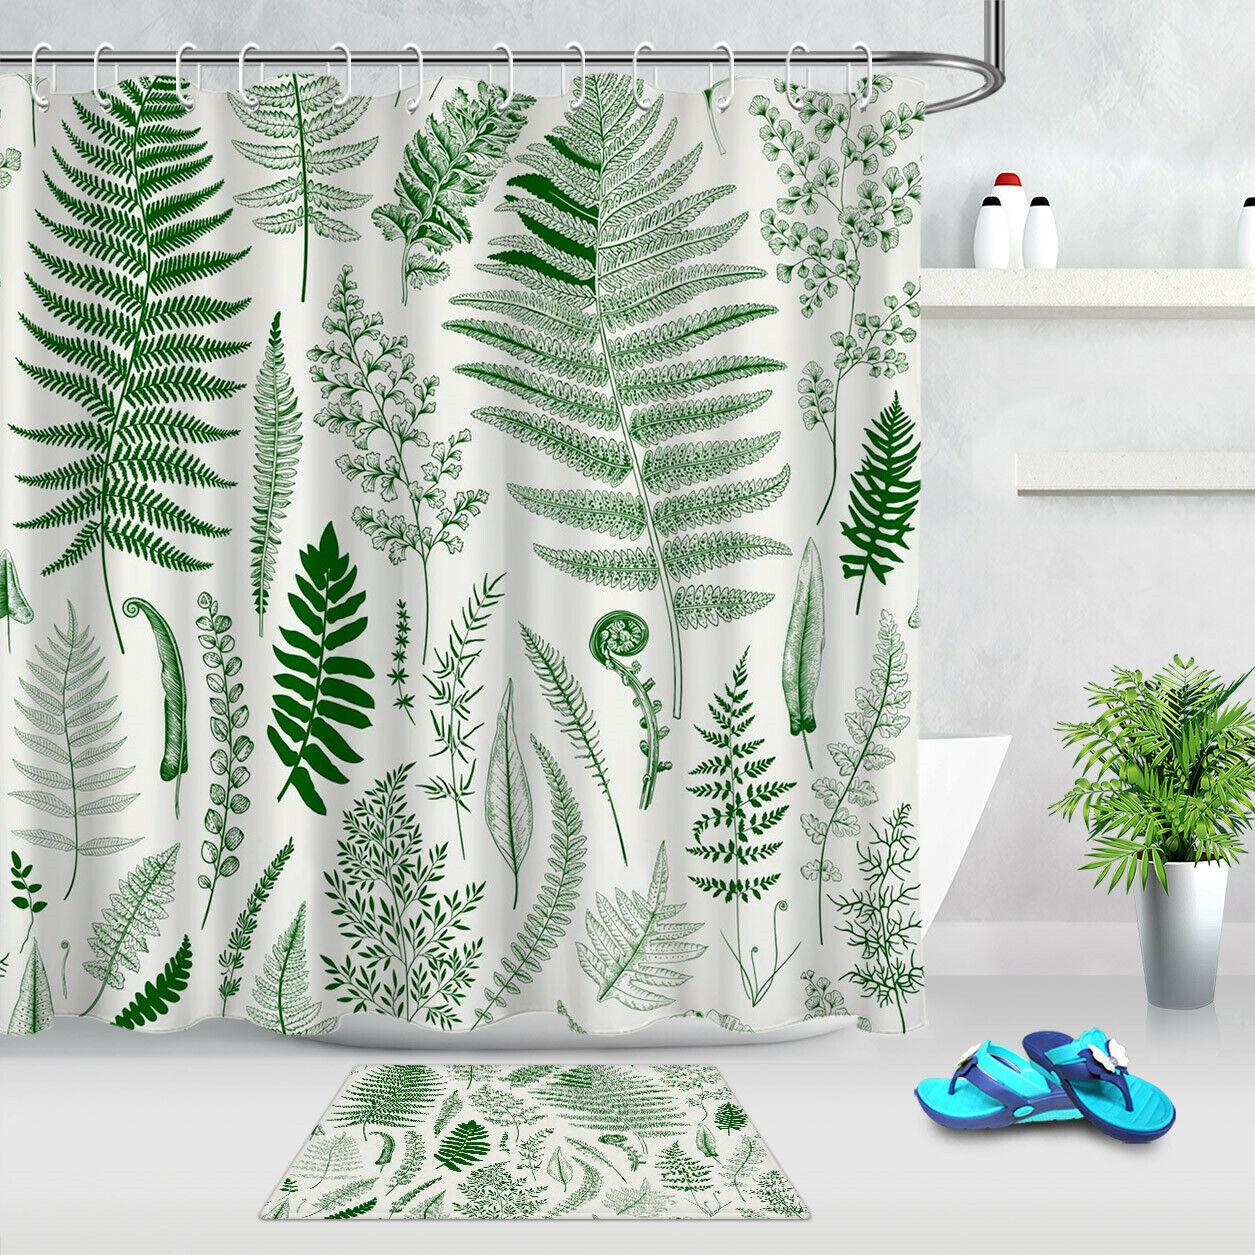 Green Plant Leaves White Shower Curtain Hooks Waterproof